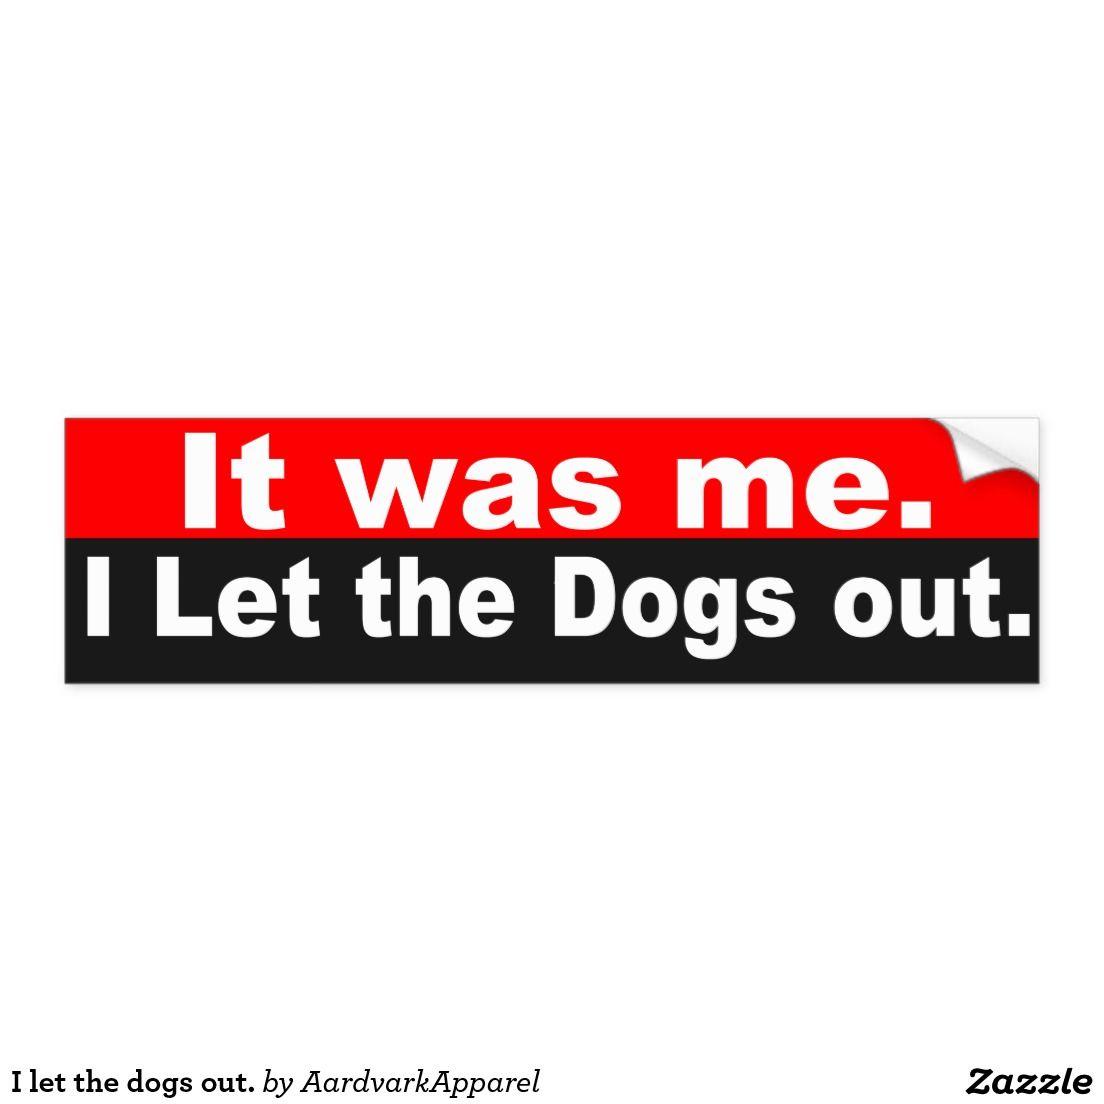 Waterproof School Labels Vinyl Sticker Name Labels Dog Stickers Durable School Labels 60 Dog School Labels Schnauzer School Labels